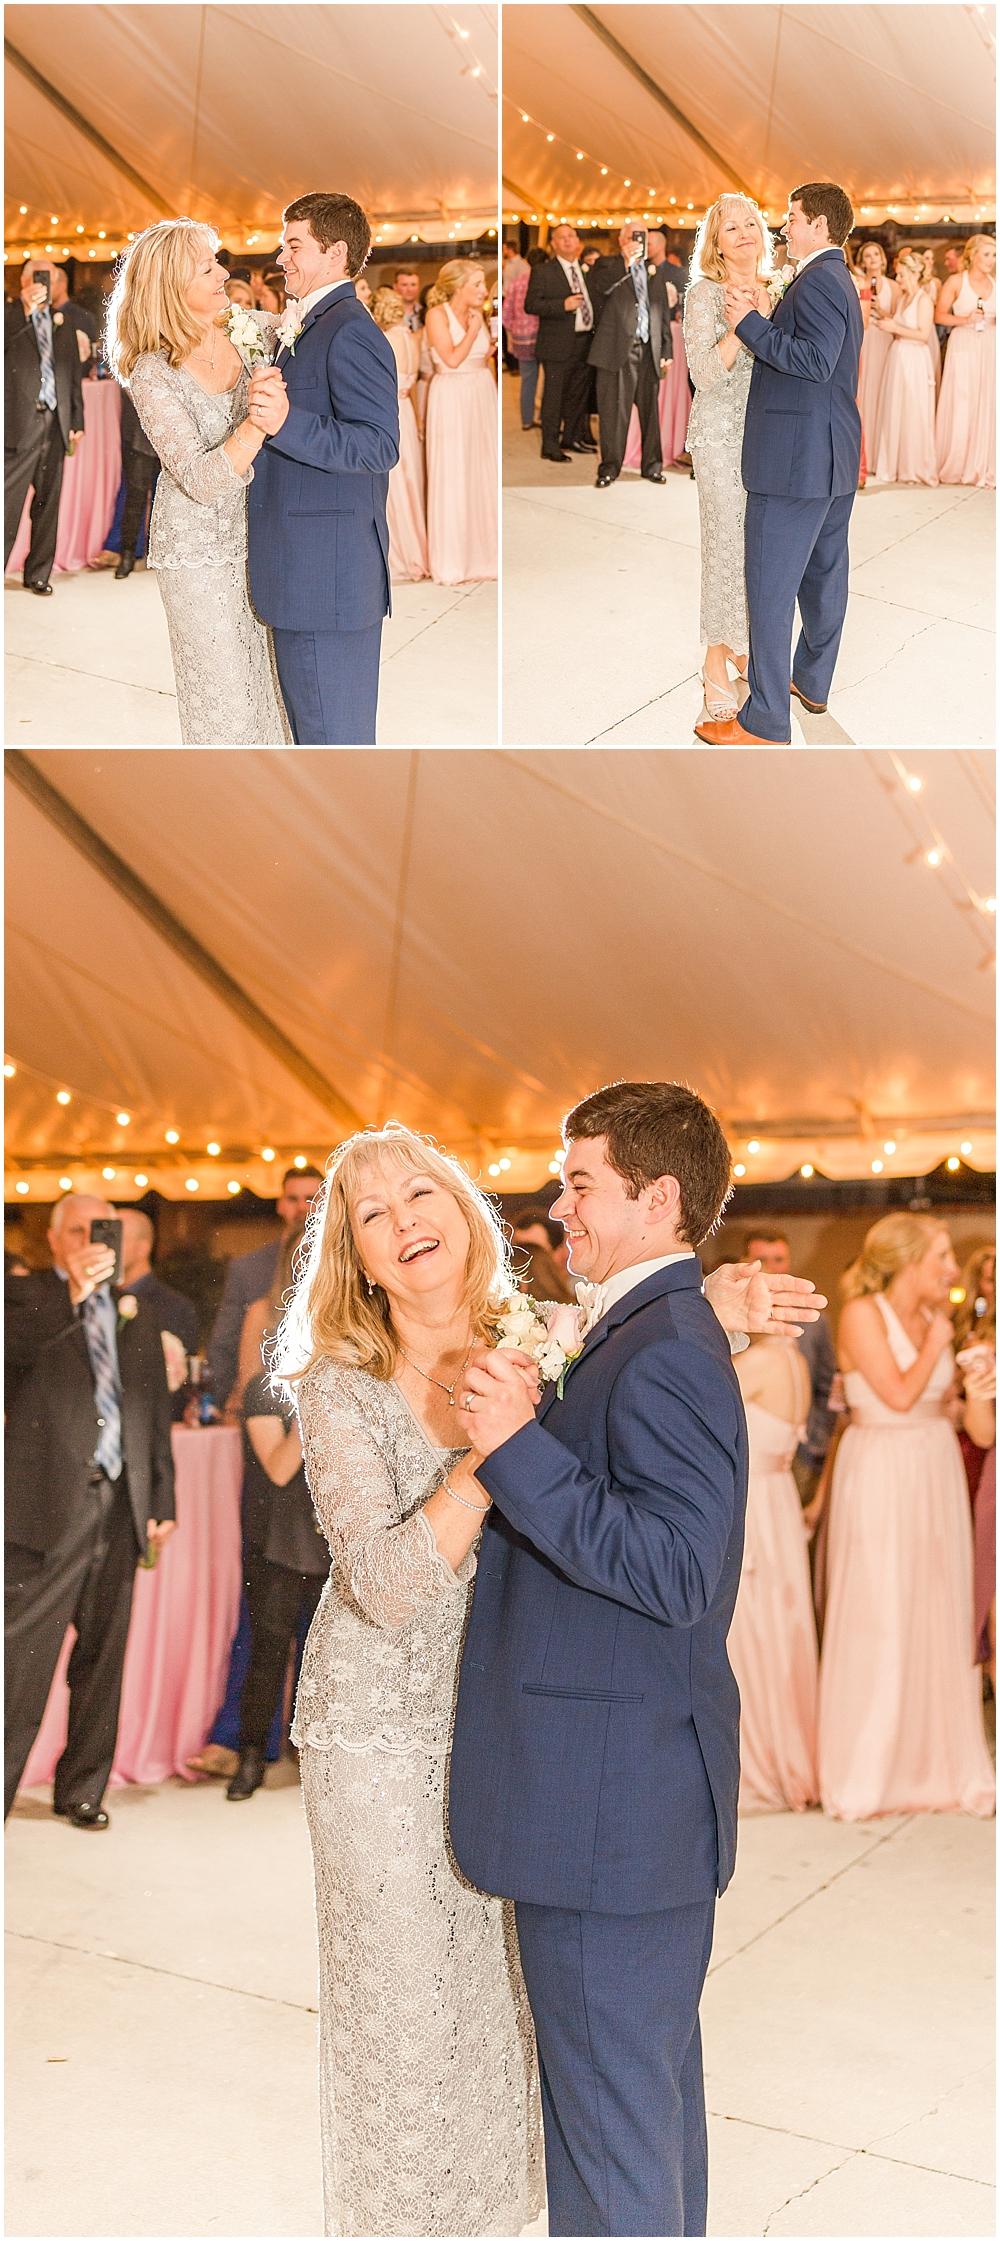 Ashton-Clark-Photography-Wedding-Portrait-Family-Photographer-Mobile-Alabama_0364.jpg